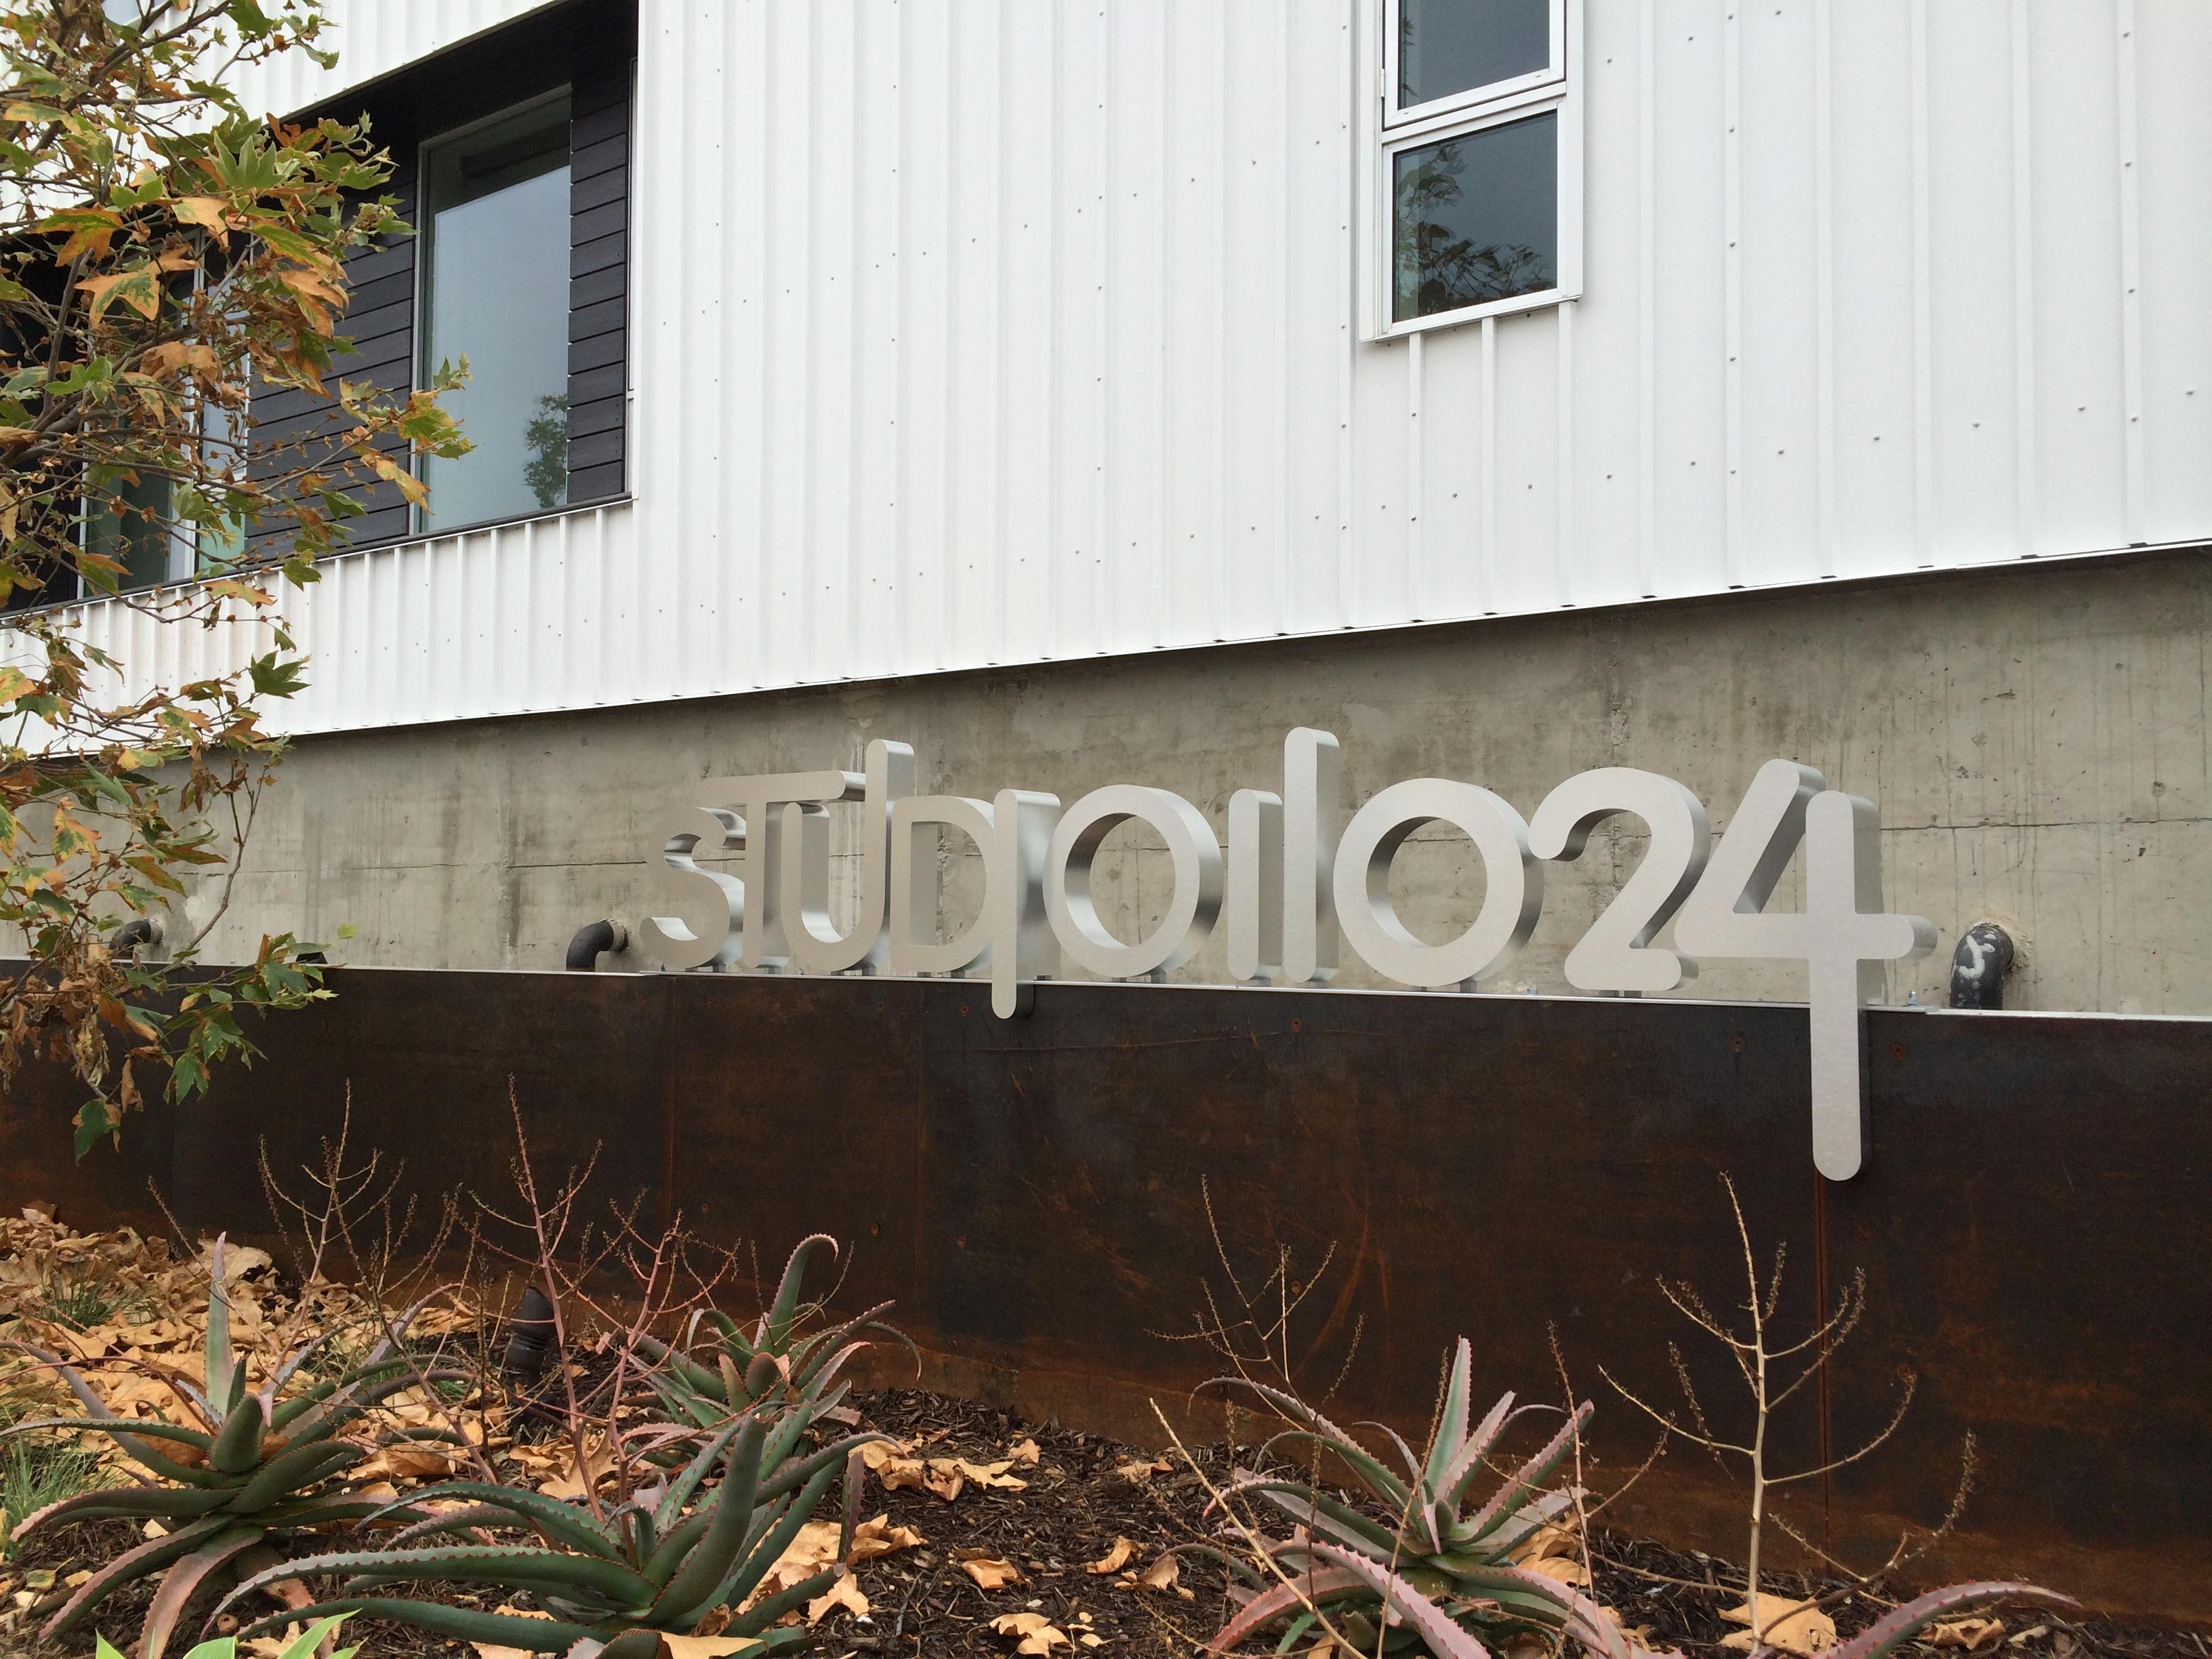 Monument Signage